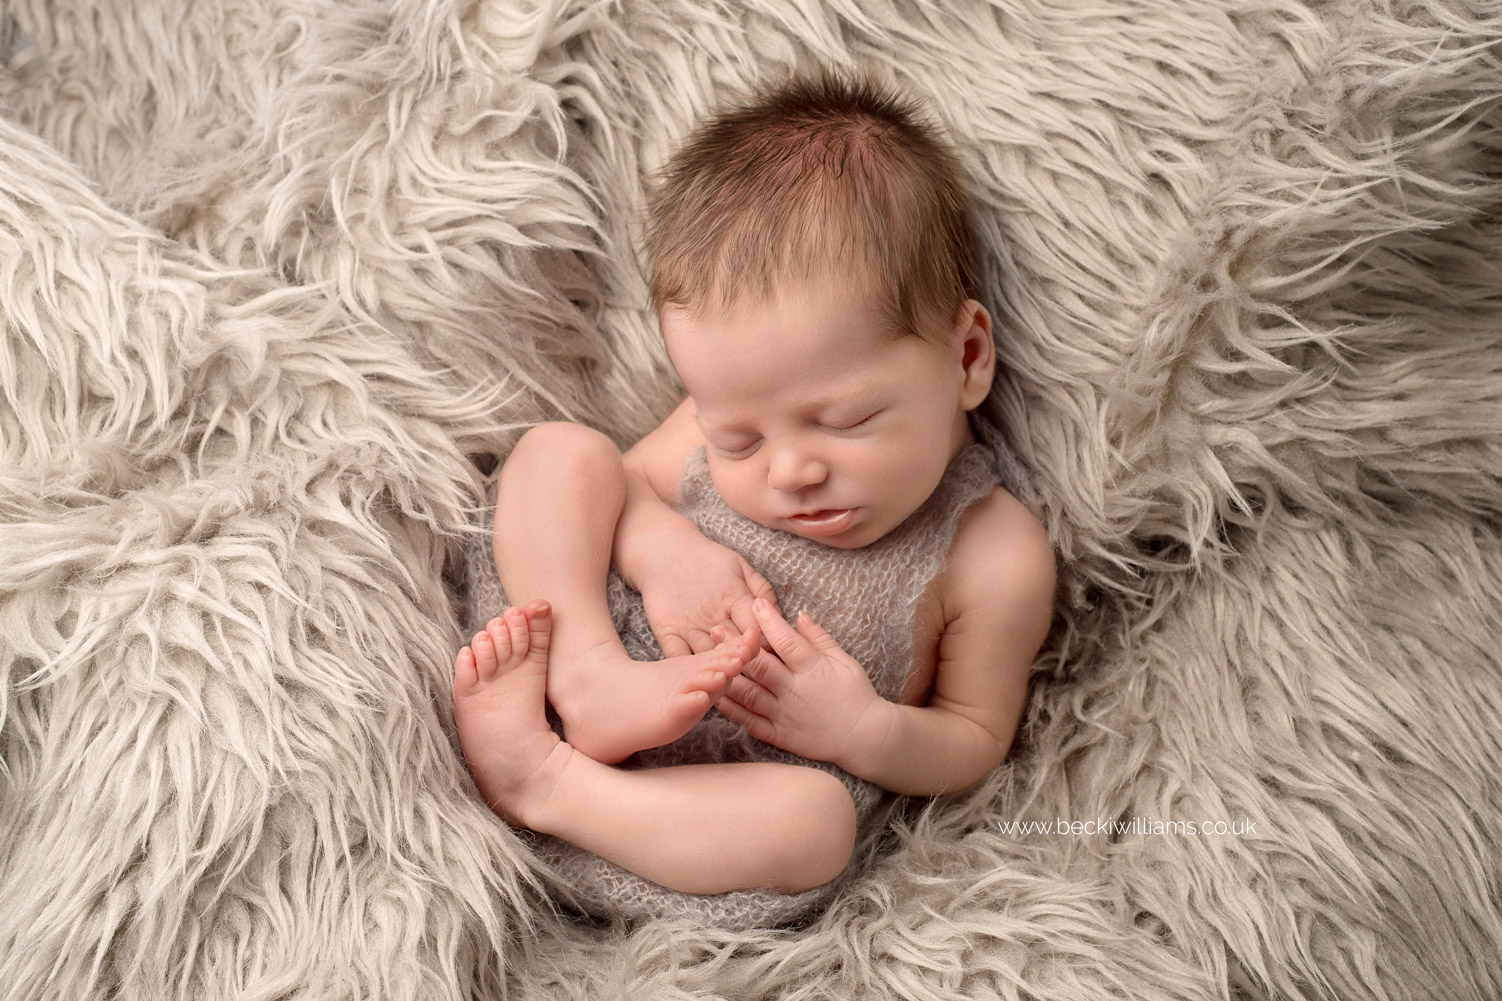 newborn boy lays sleeping on a grey furry blanket, wearing a grey romper for his newborn photo shoot in hemel hempstead